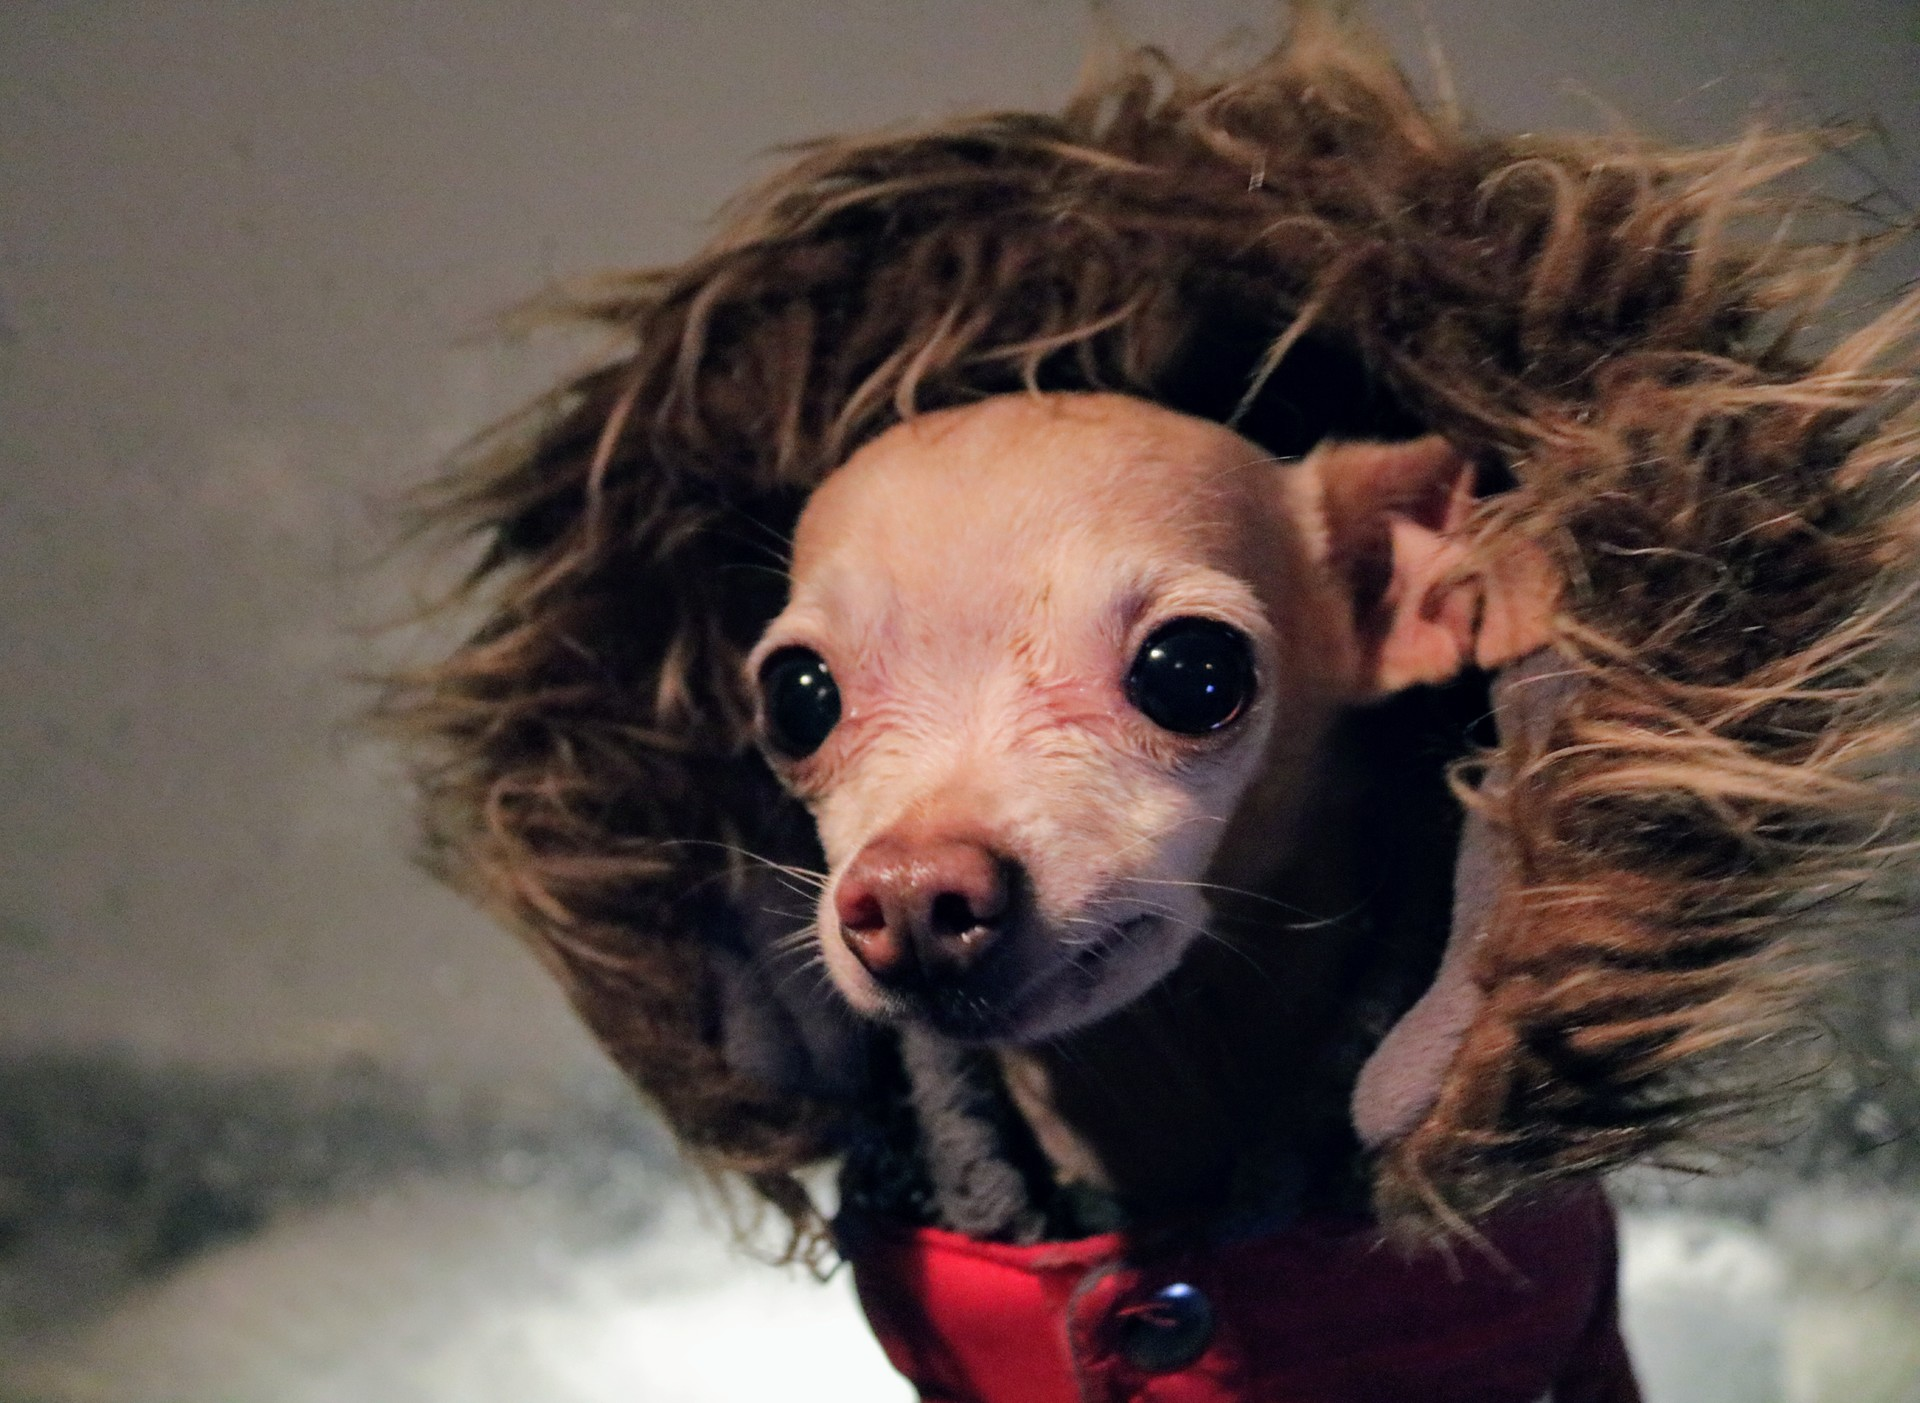 Chihuahua | rick.cognyl.fournier, dog, canine, cute